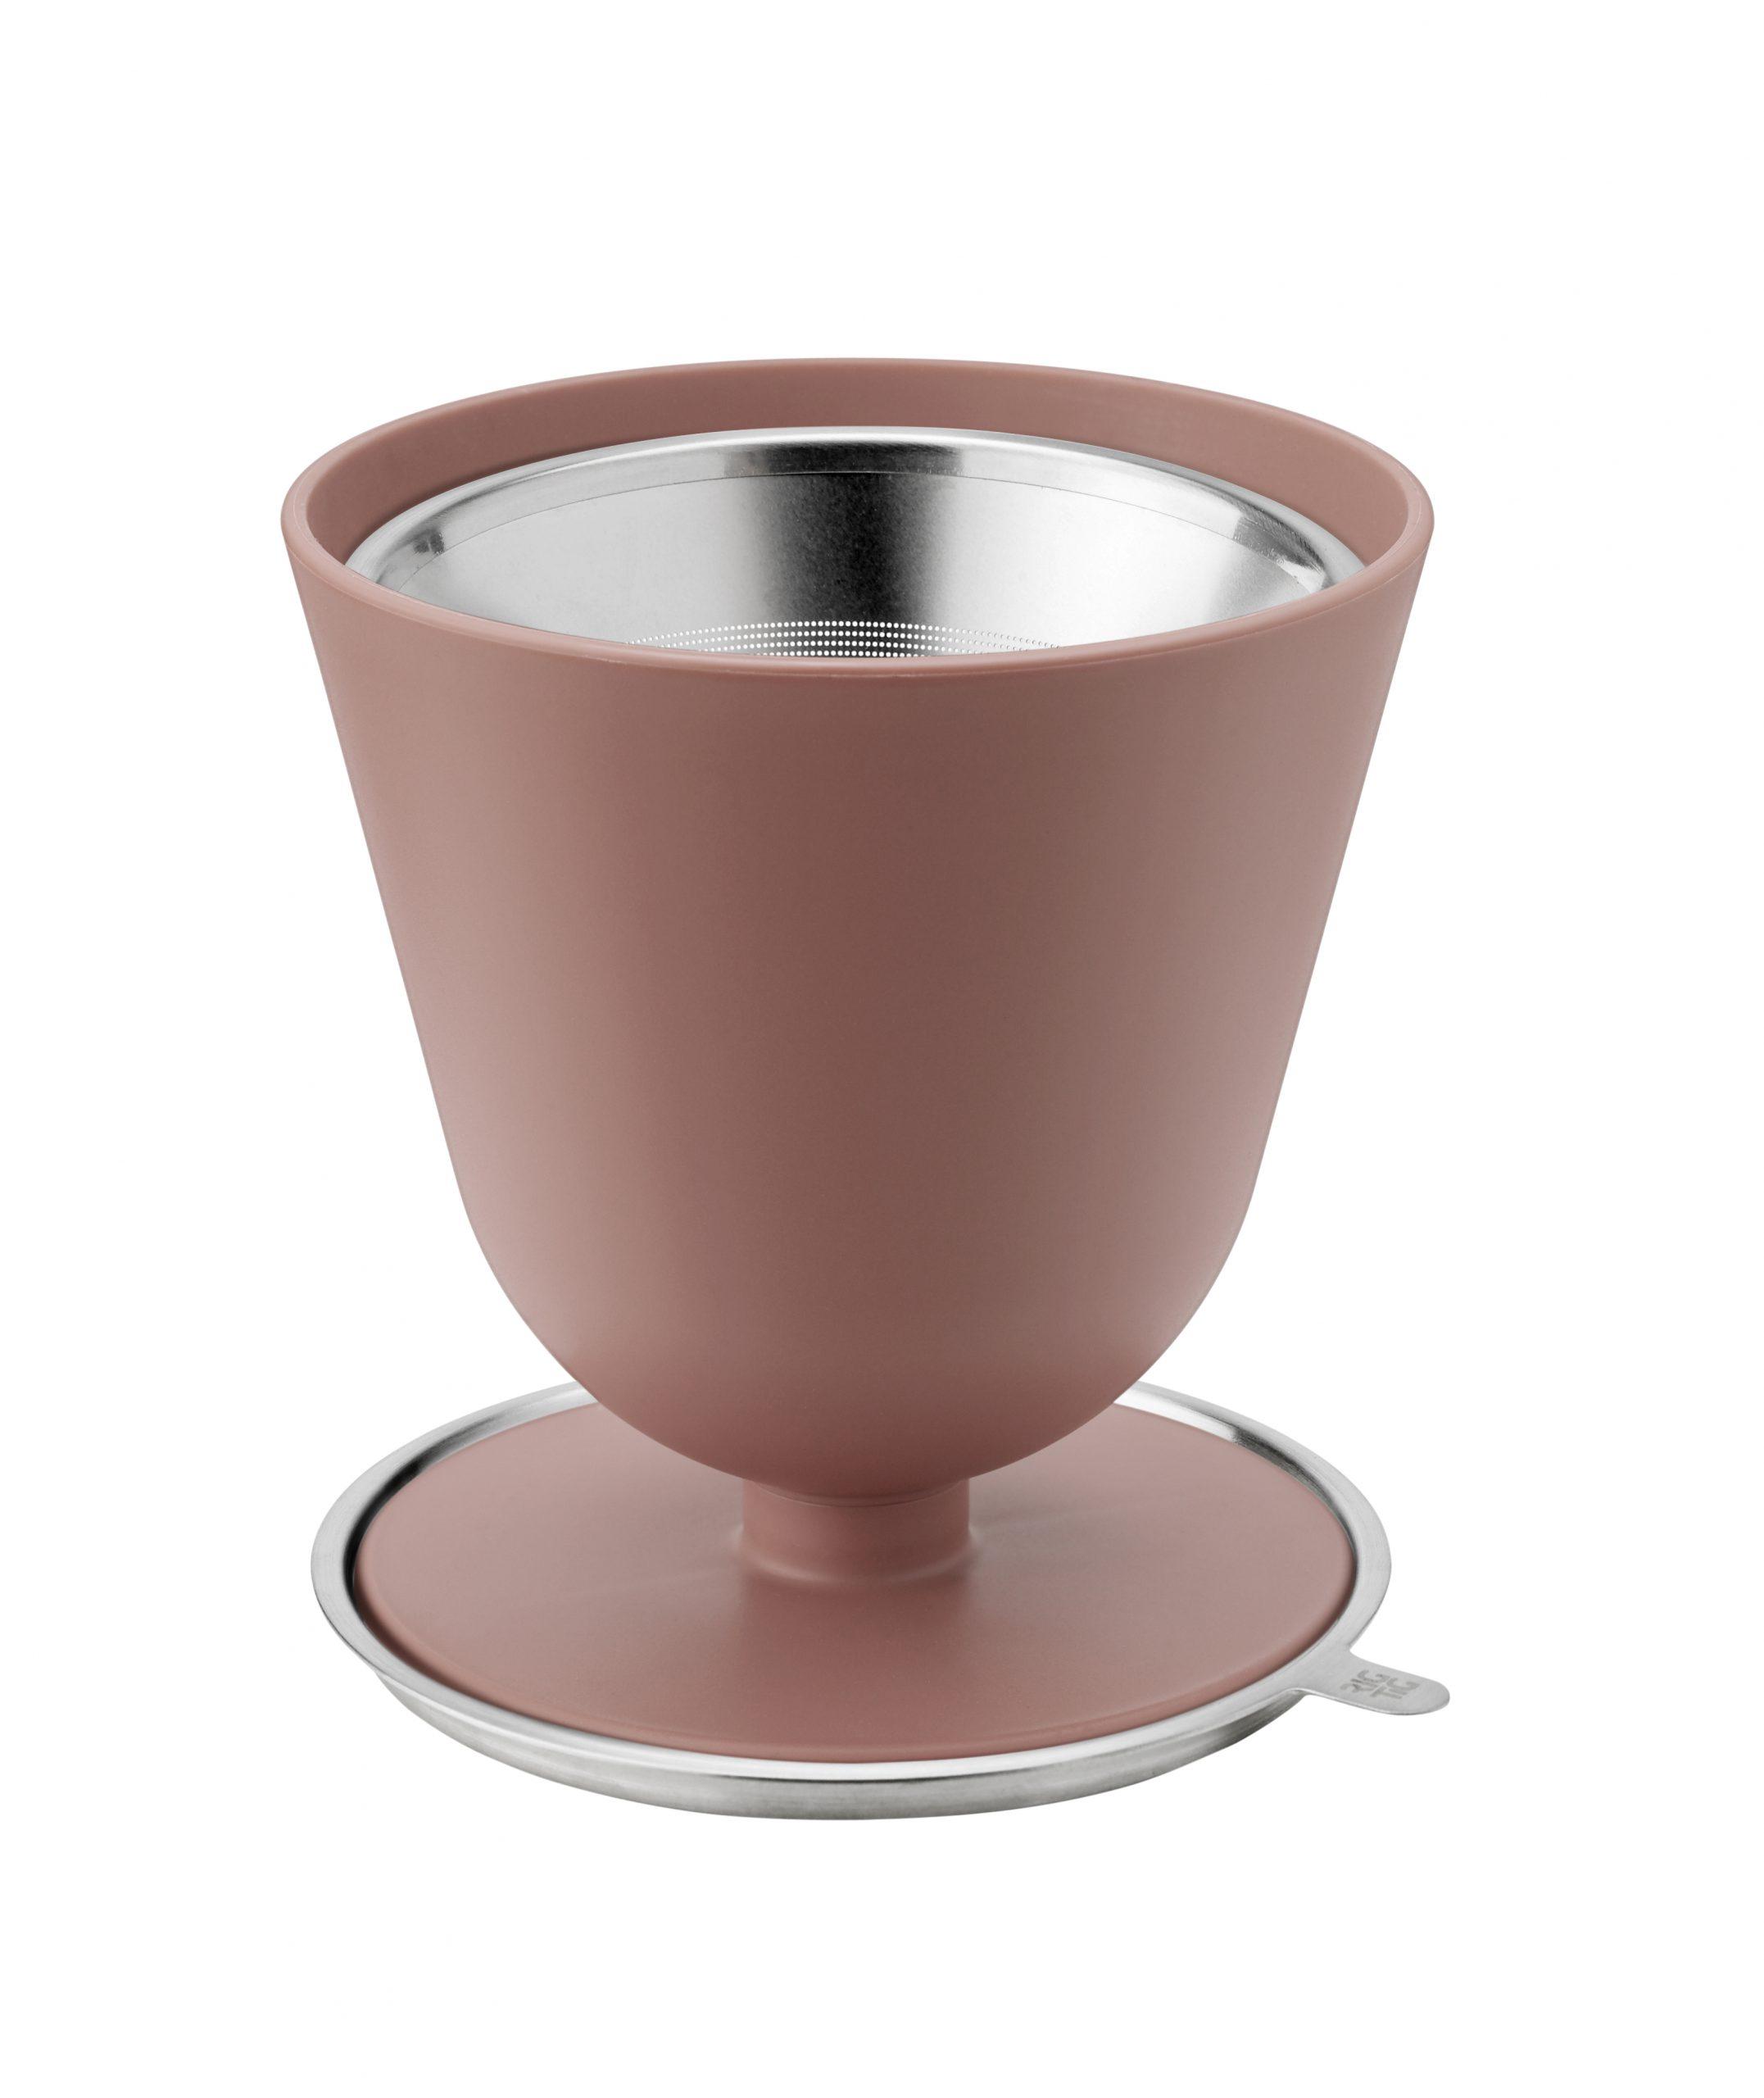 Slow coffee dripper by Debiasi Sandri for RigTig